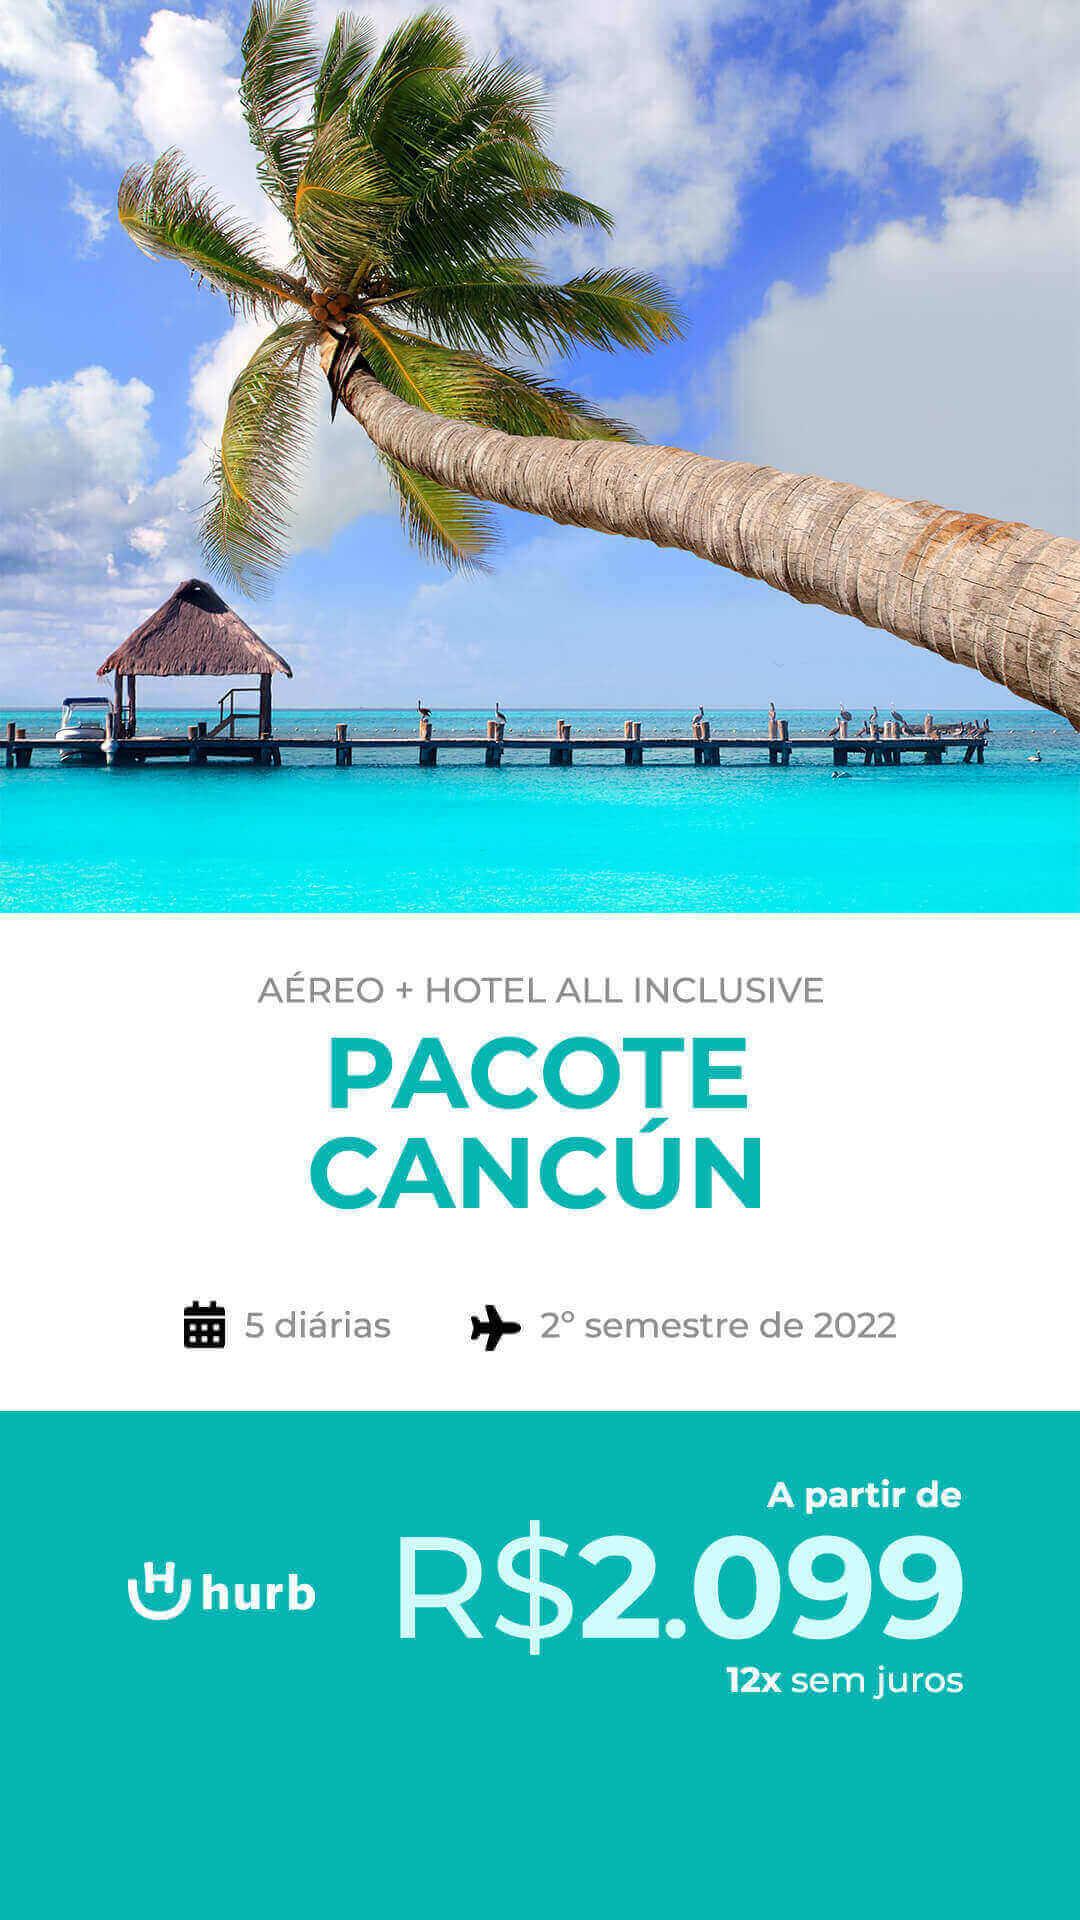 pacote cancun all inclusive segundo semestre 2022